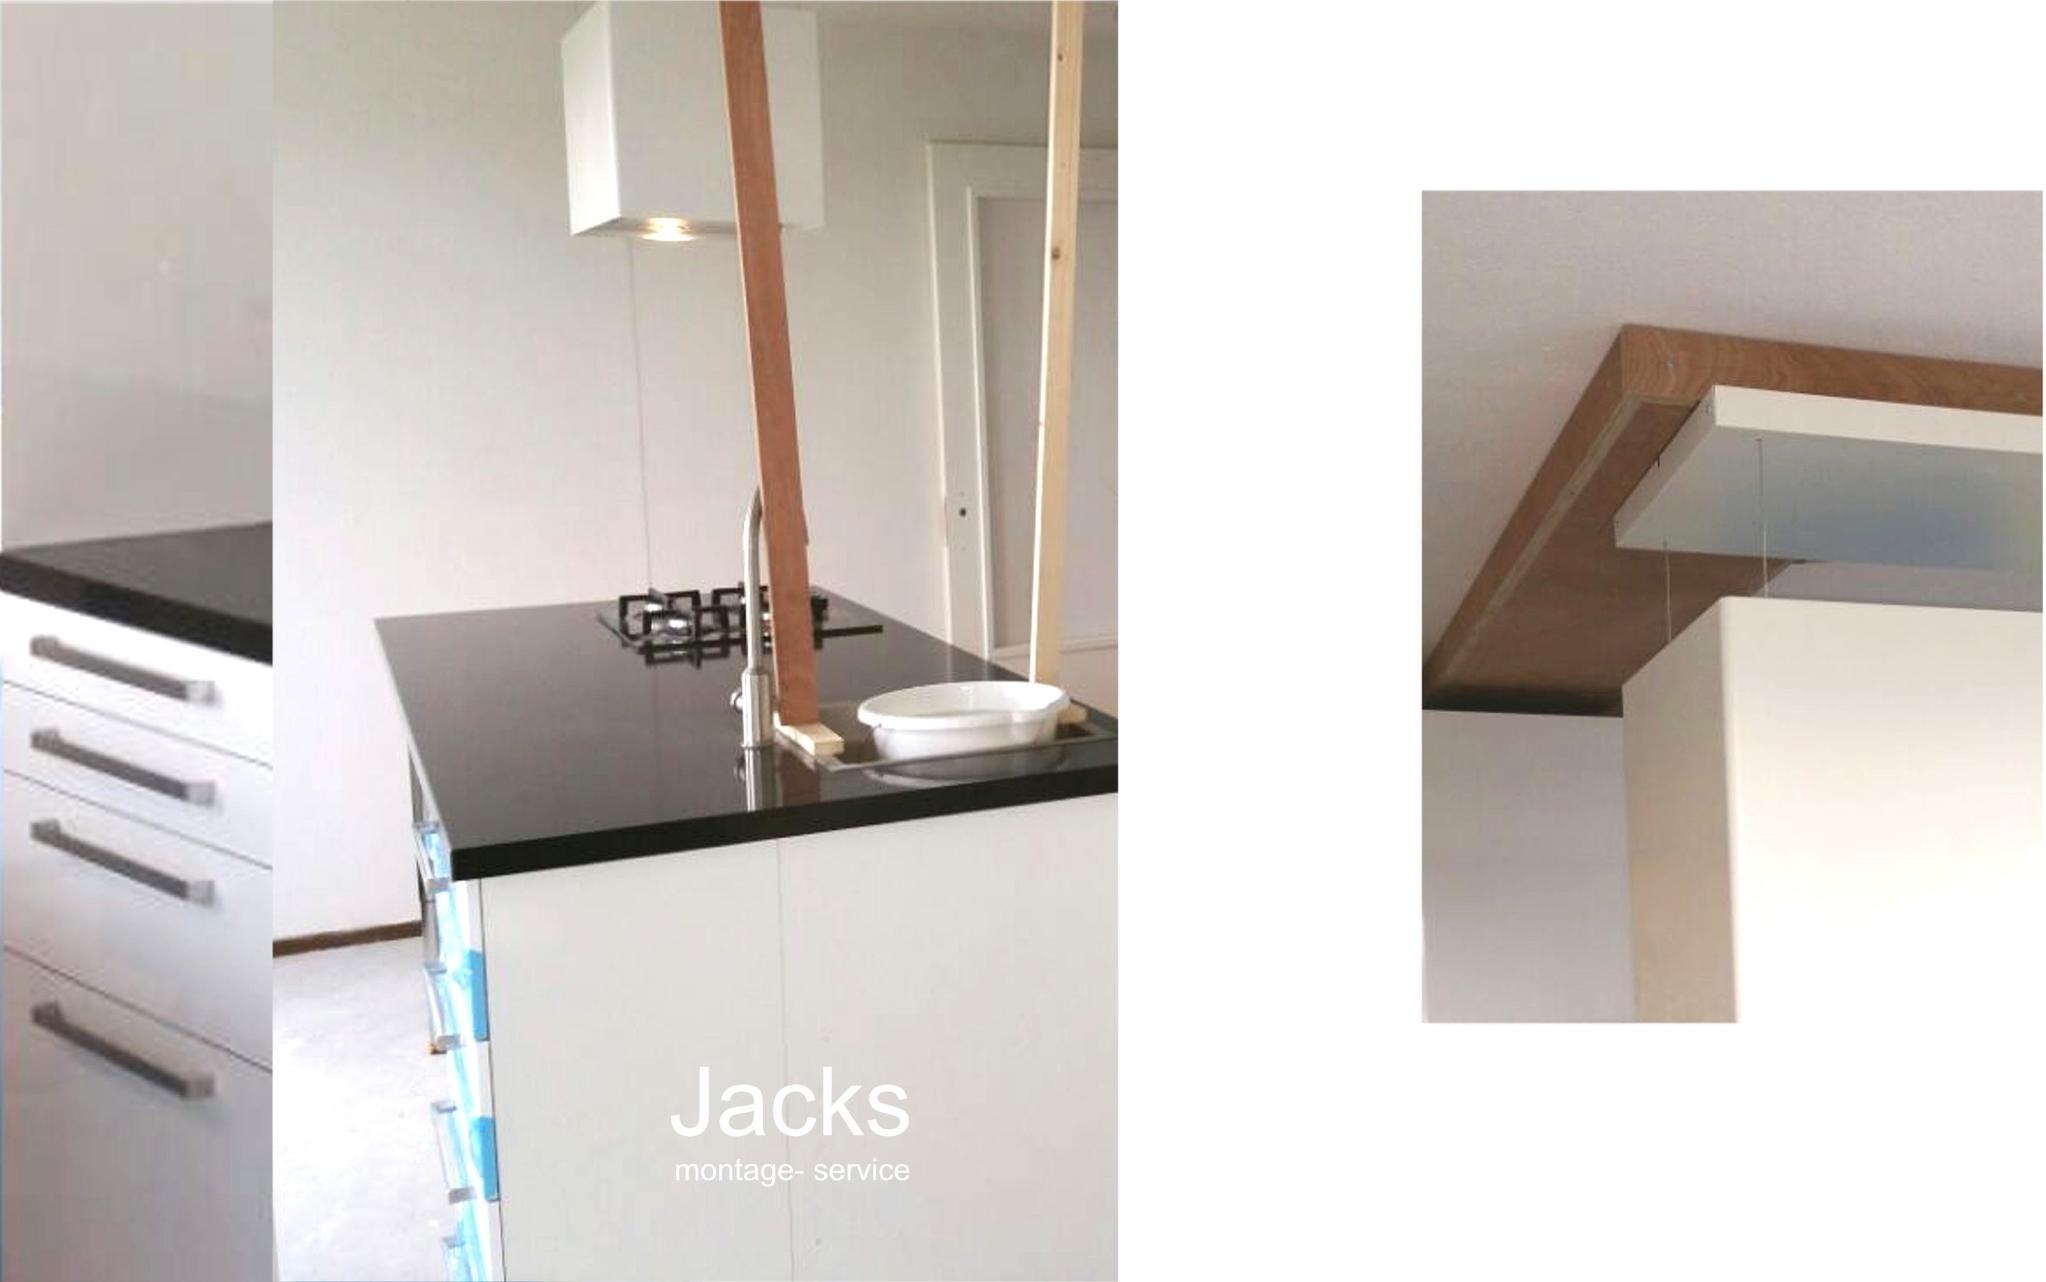 ikea werkblad op maat. Black Bedroom Furniture Sets. Home Design Ideas